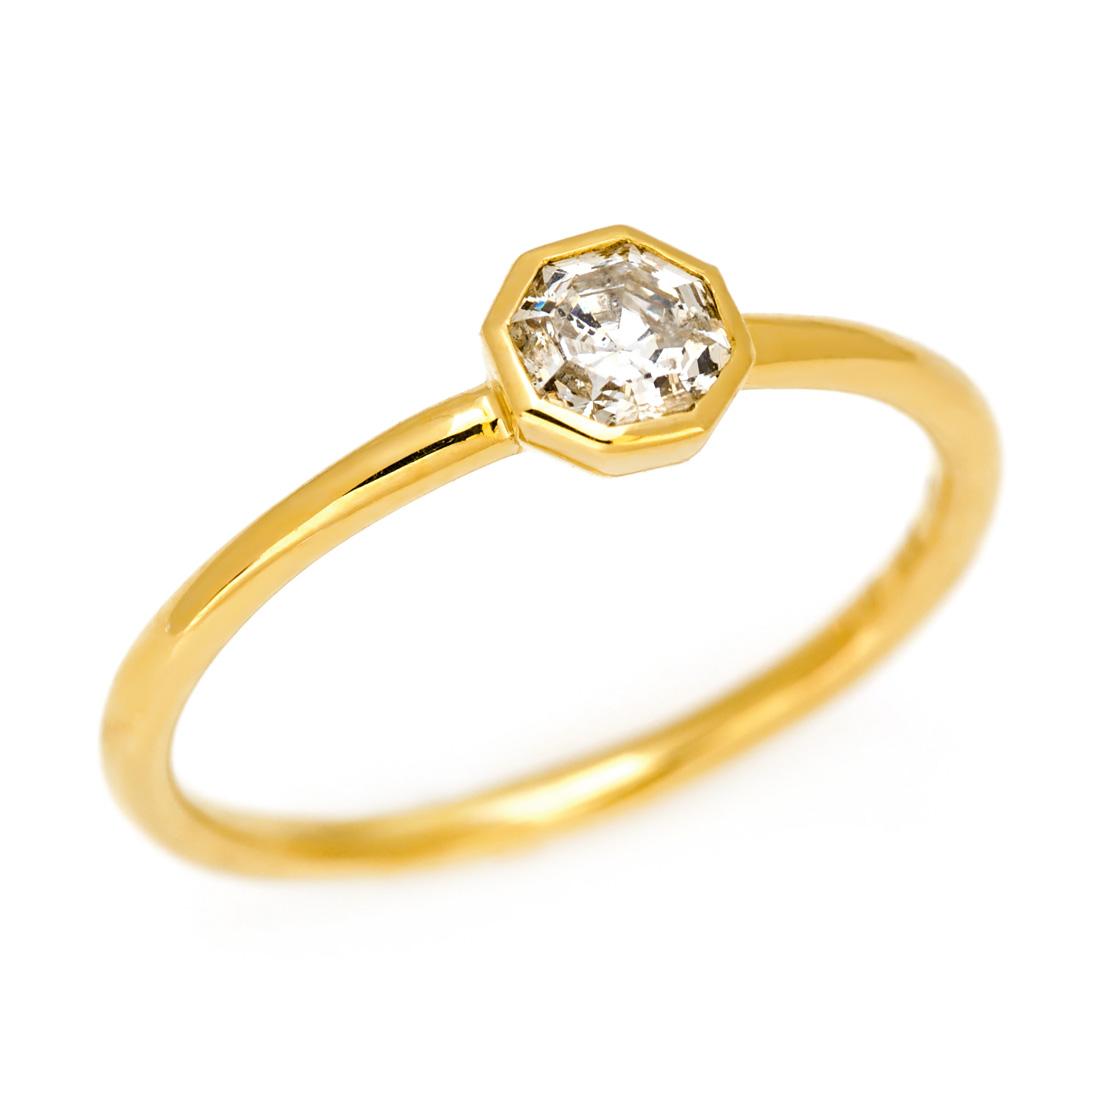 K18 0.3ct オクタゴン ダイヤモンド リング 指輪 ゴールド 18K 18金 ダイアモンド 誕生日 4月誕生石 刻印 文字入れ メッセージ ギフト 贈り物 ピンキーリング対応可能